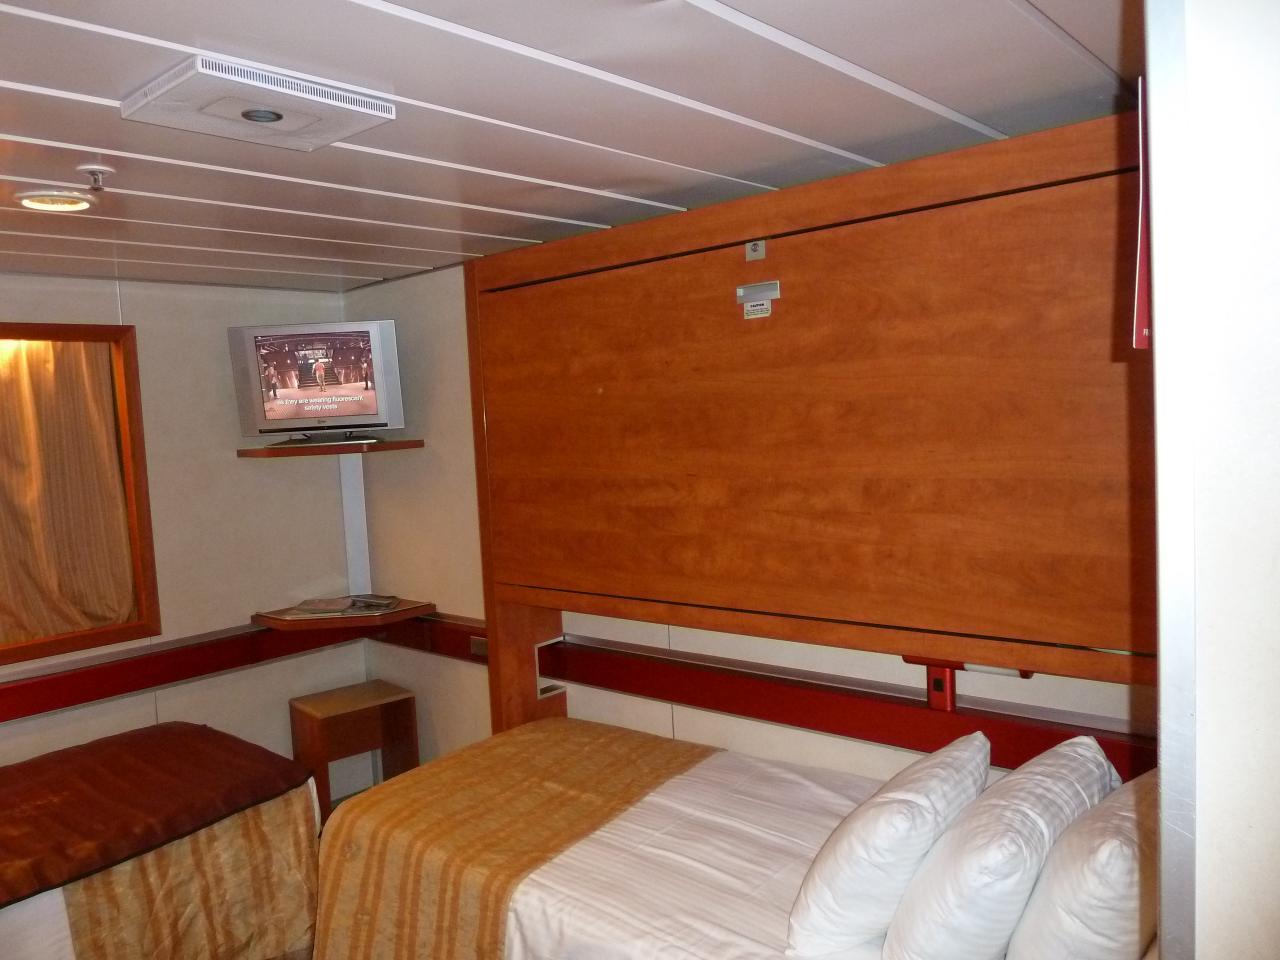 Carnival Ecstasy Interior Rooms Carnival Ecstasy cabin